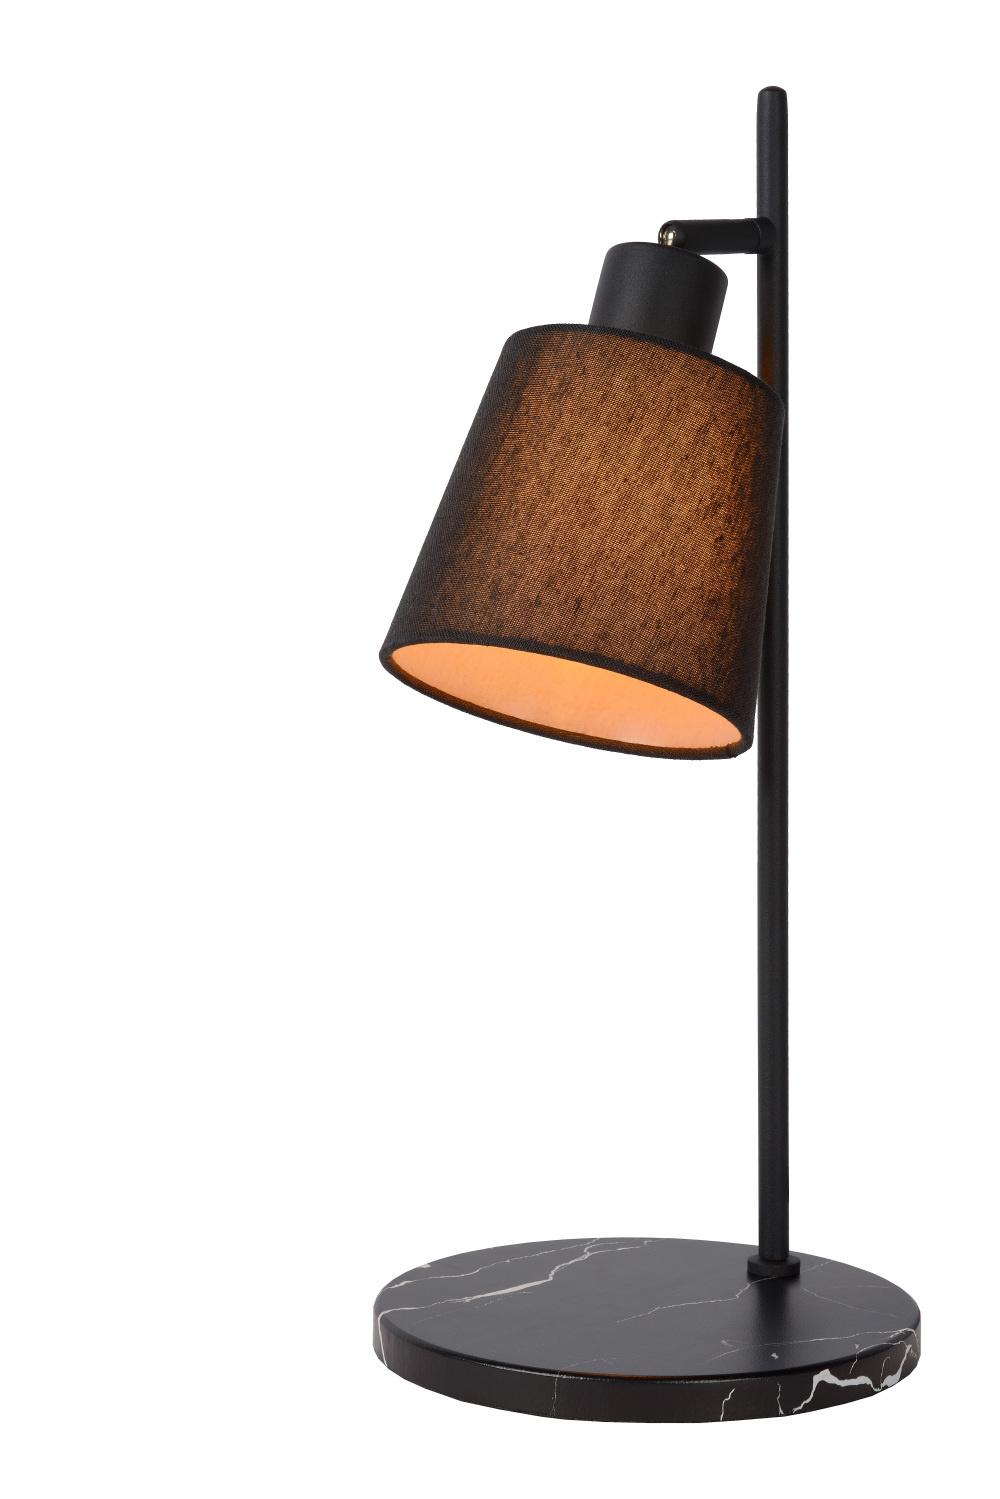 Lucide PIPPA Tafellamp-Zwart-1xE27-25W-Metaal